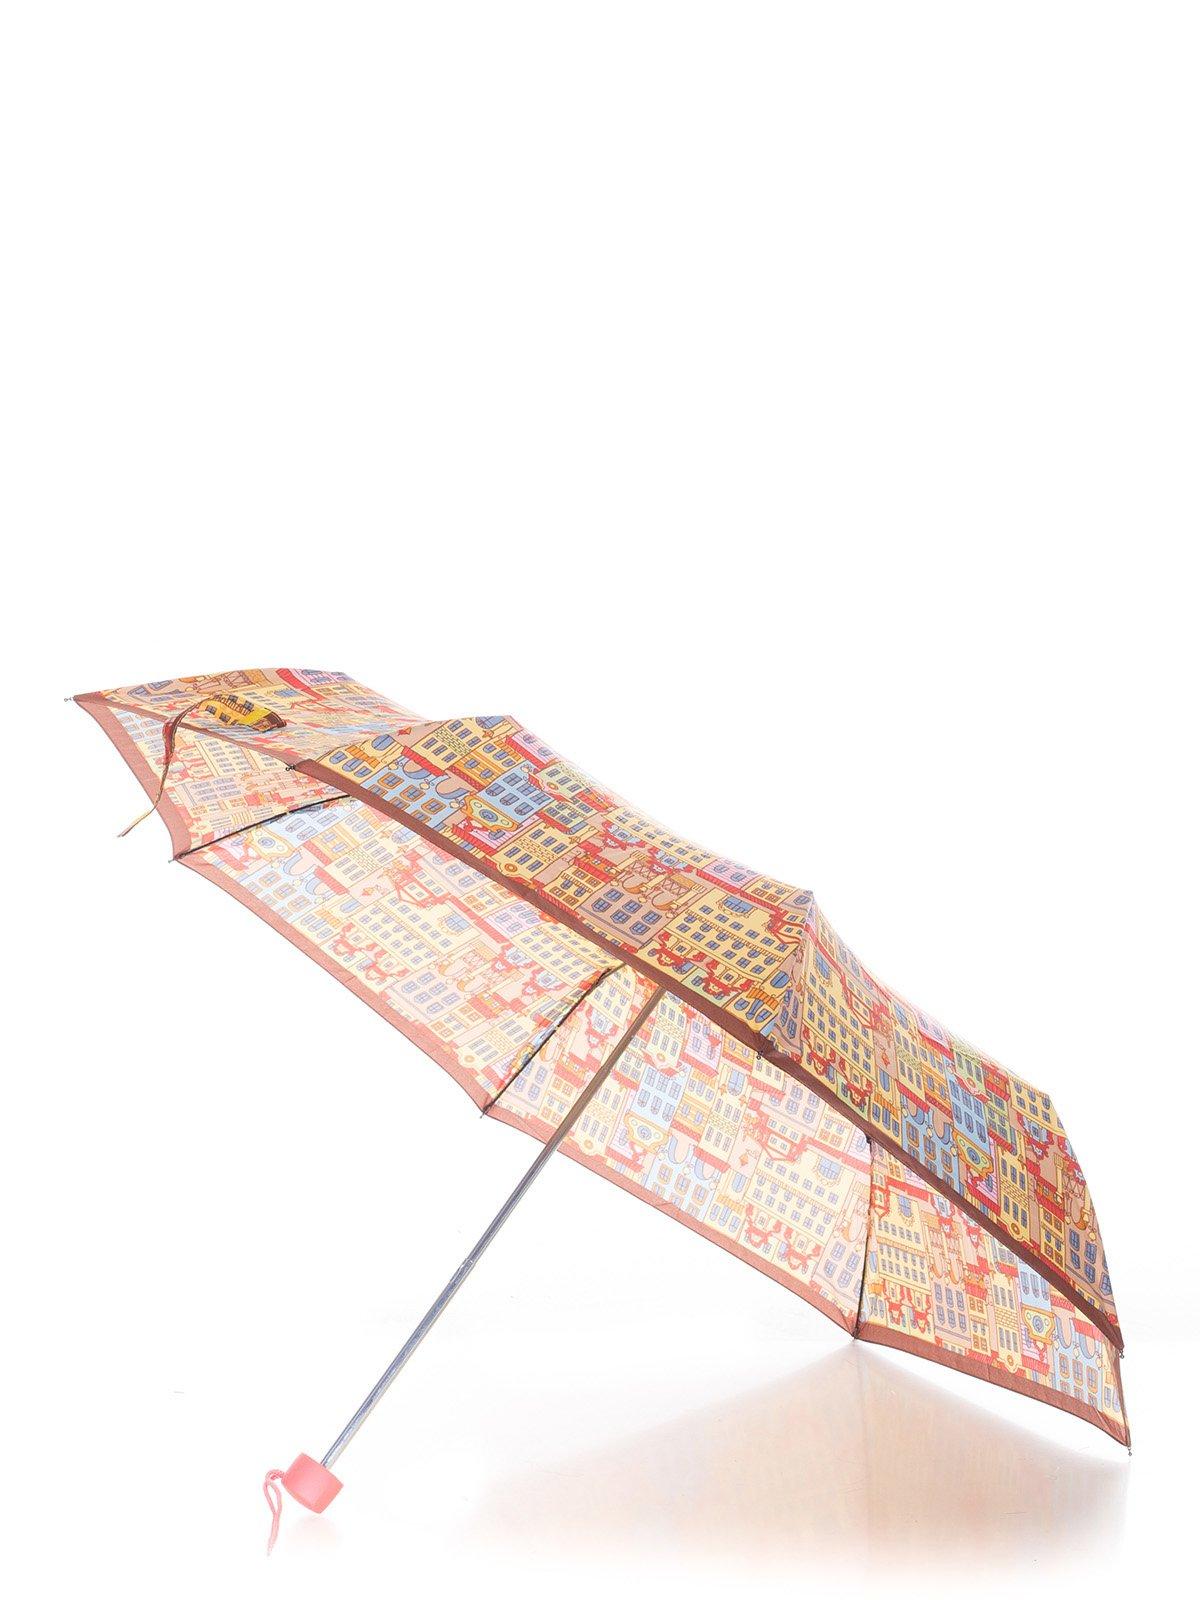 Зонт | 3296674 | фото 2